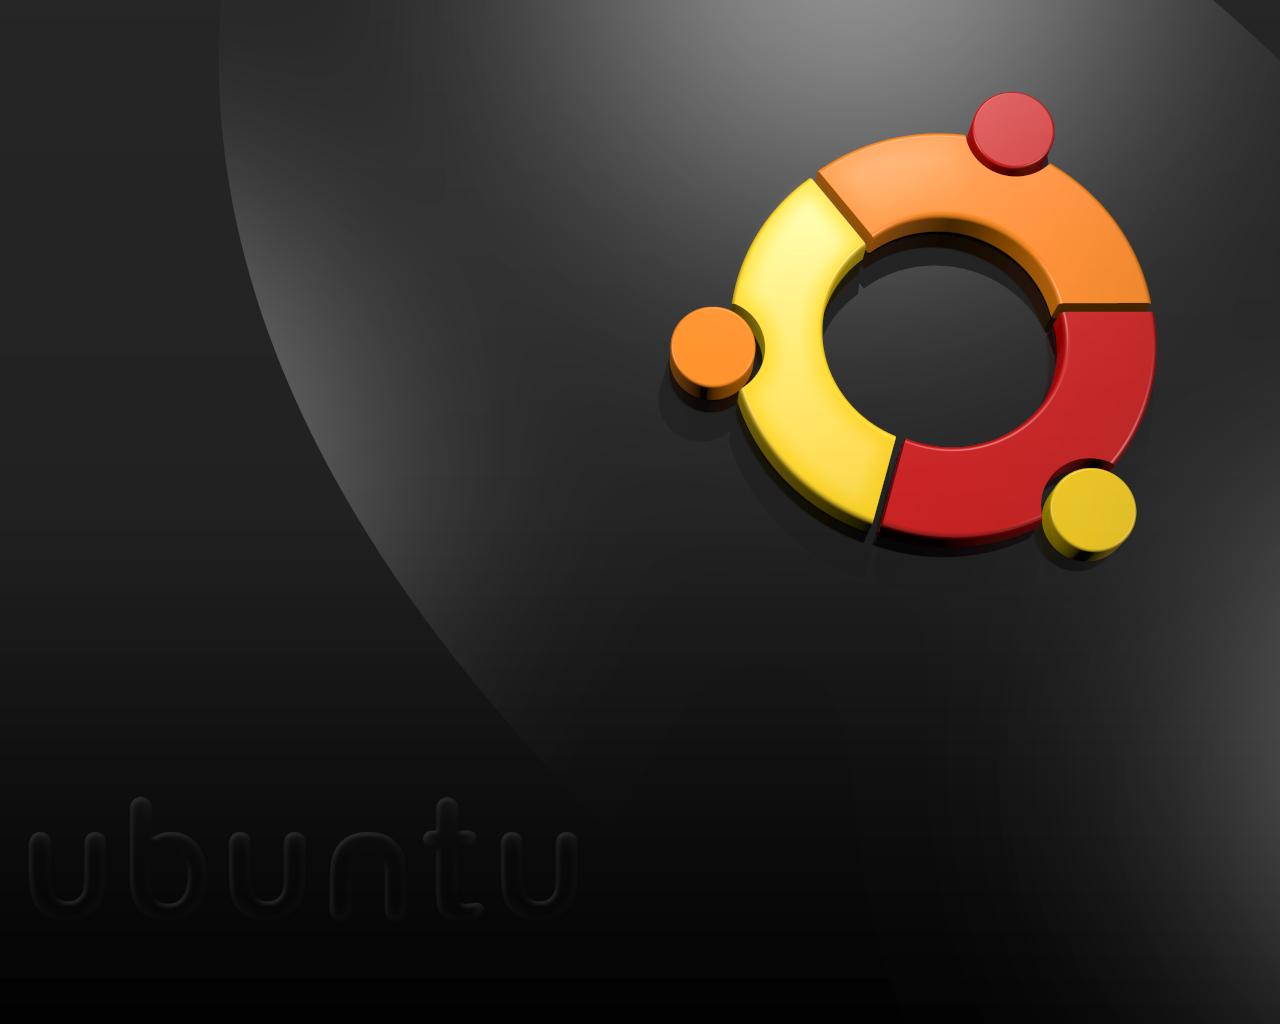 Ubuntu Black wallpaper 1280x1024